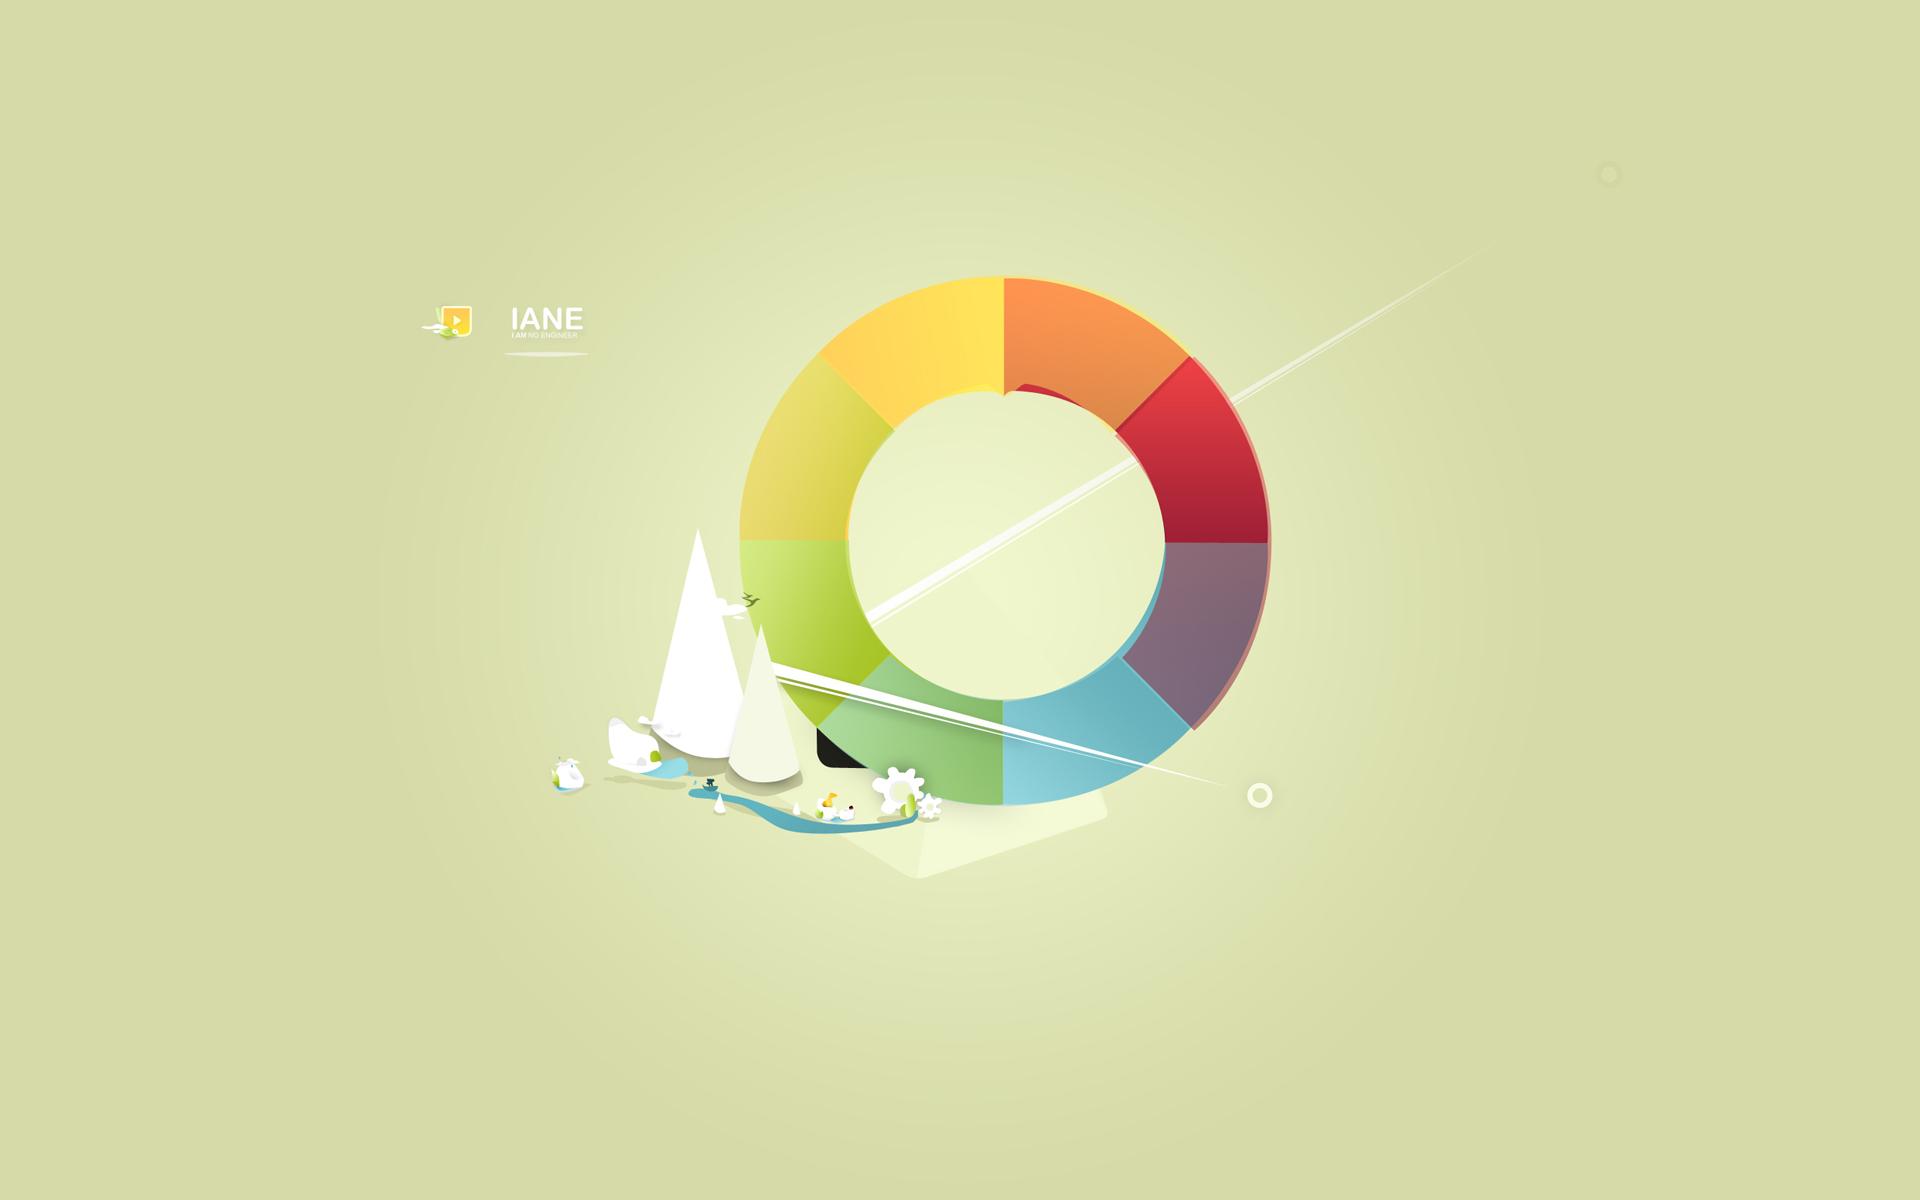 Clean Wallpaper Design : Pics Photos - An Other Clean Wallpaper Design